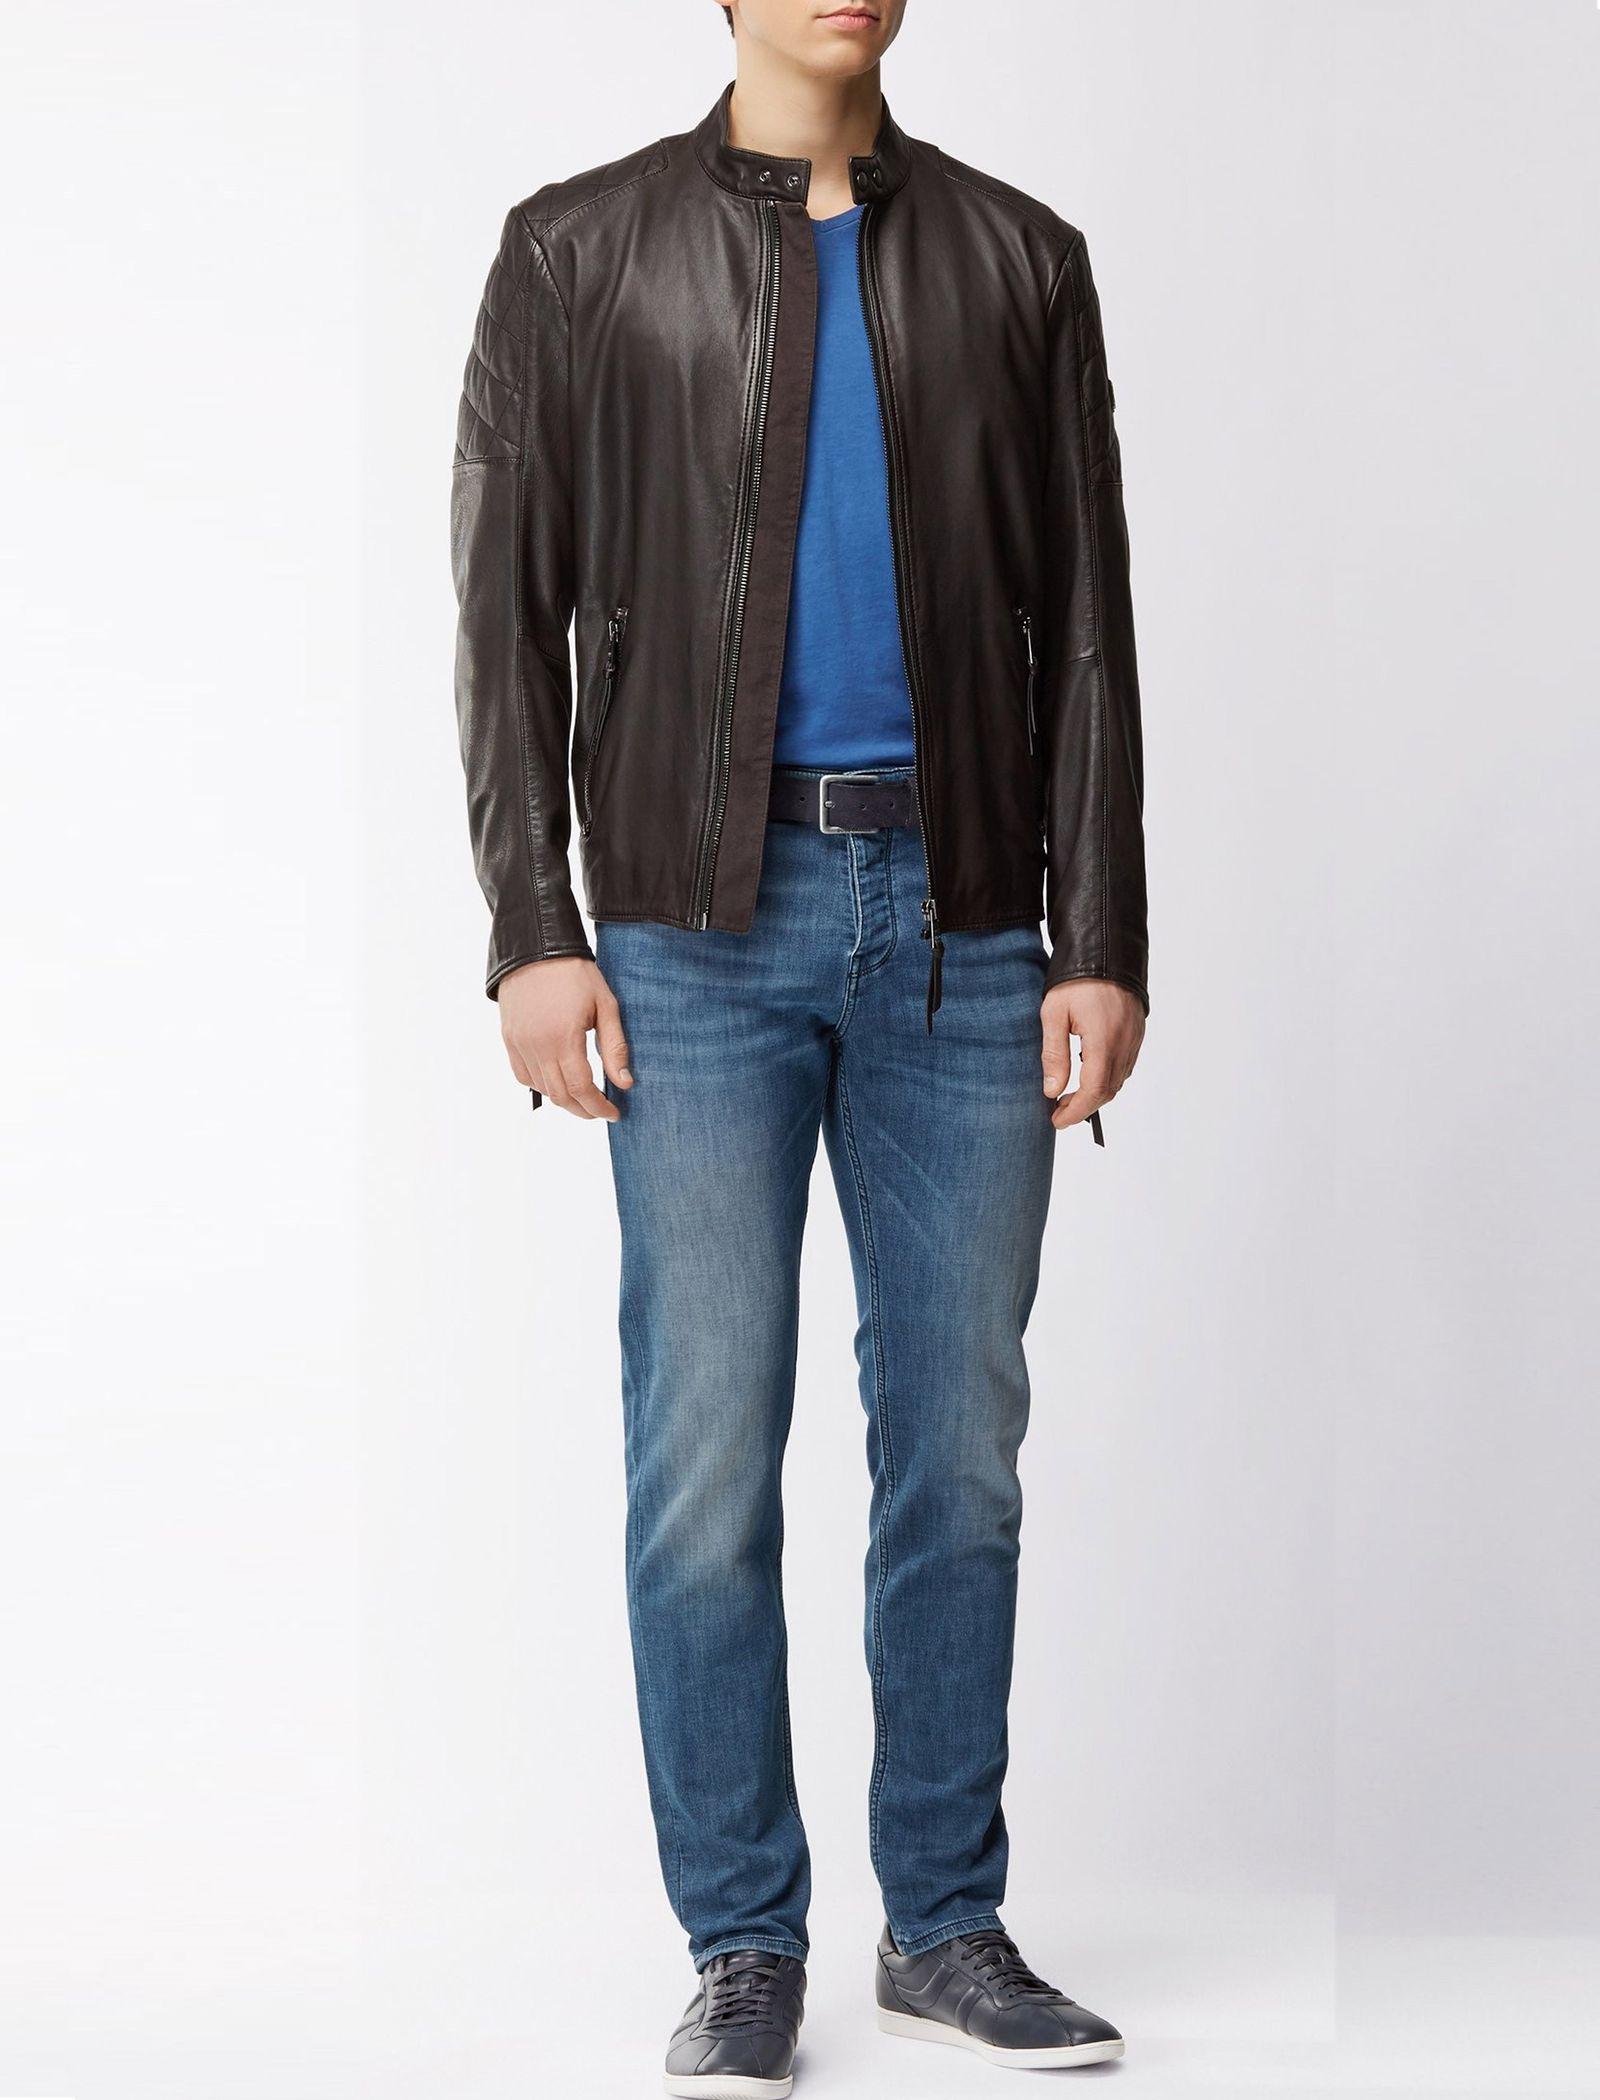 شلوار جین راسته مردانه Orange90-P SUAVE - باس اورنج - آبي تيره - 2